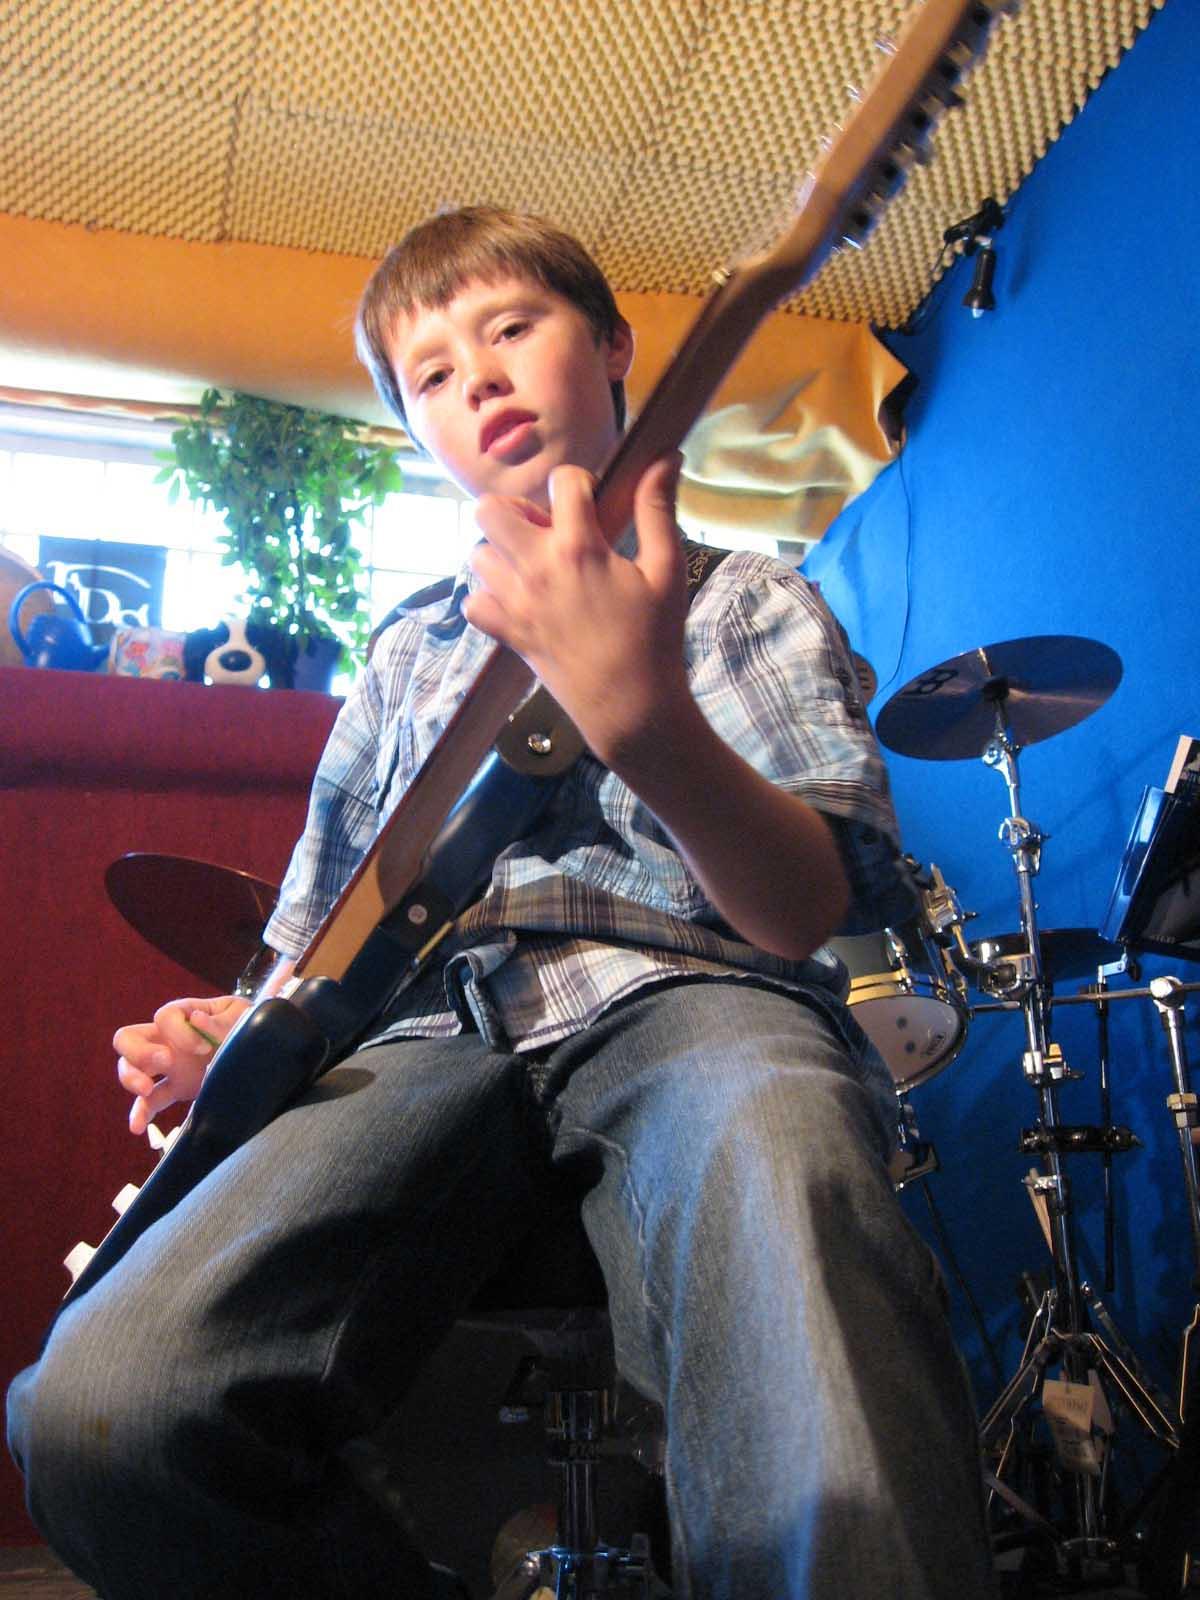 gitarre-musikschule-powerplay-11